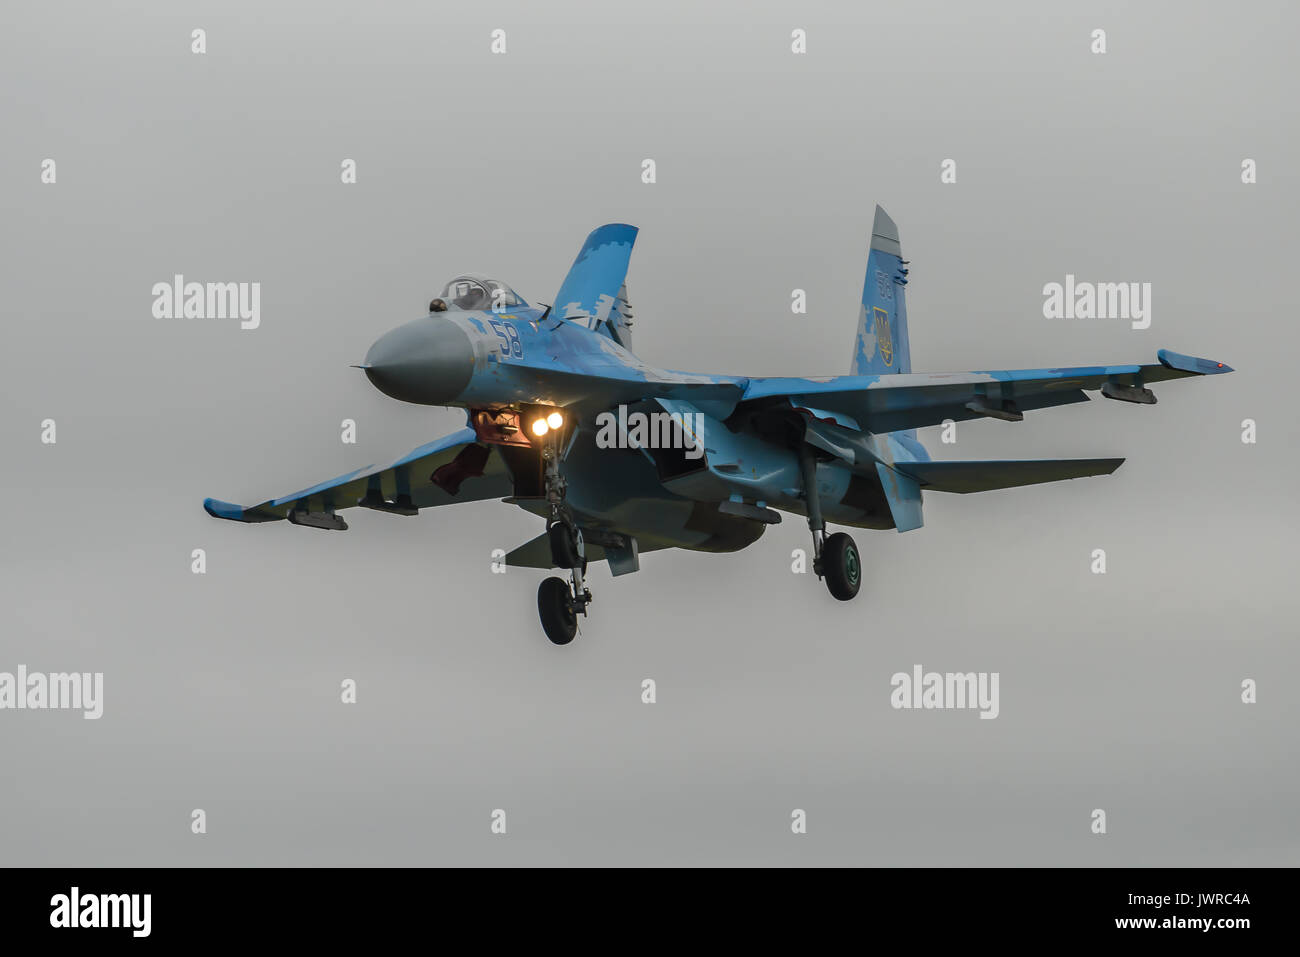 SU-27 Flanker - Stock Image